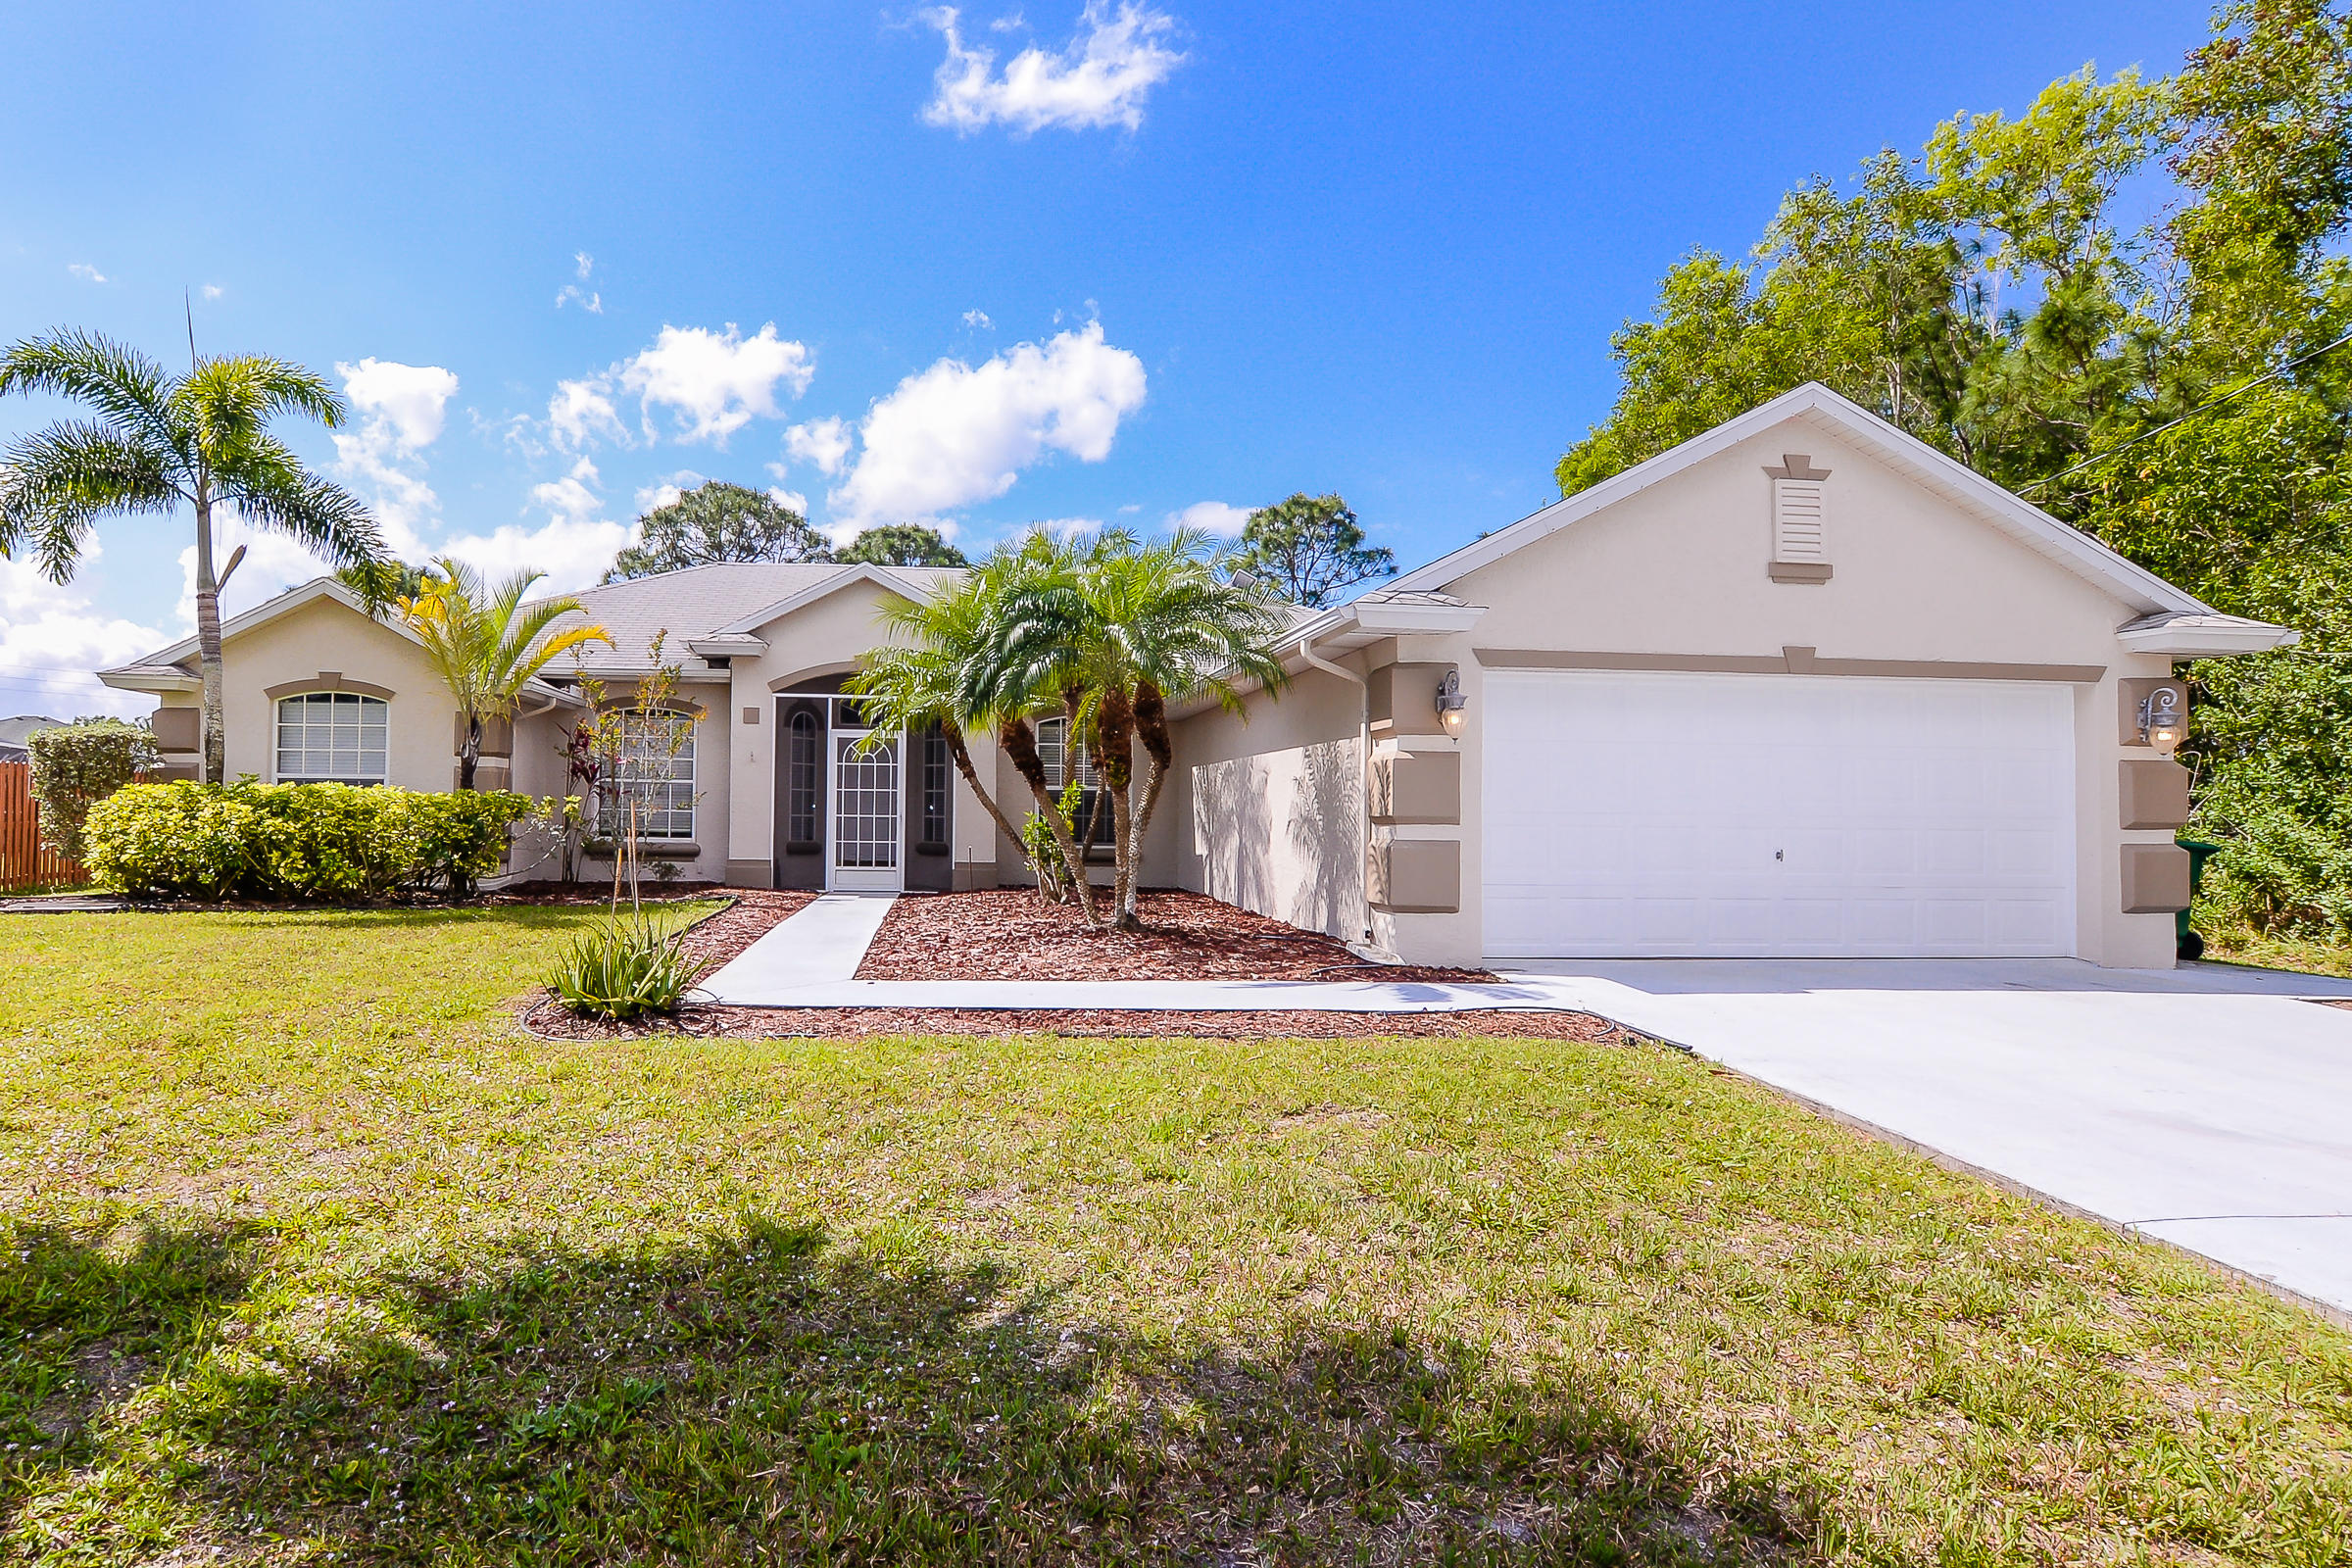 5322 NW Lamoore Lane - Port St Lucie, Florida